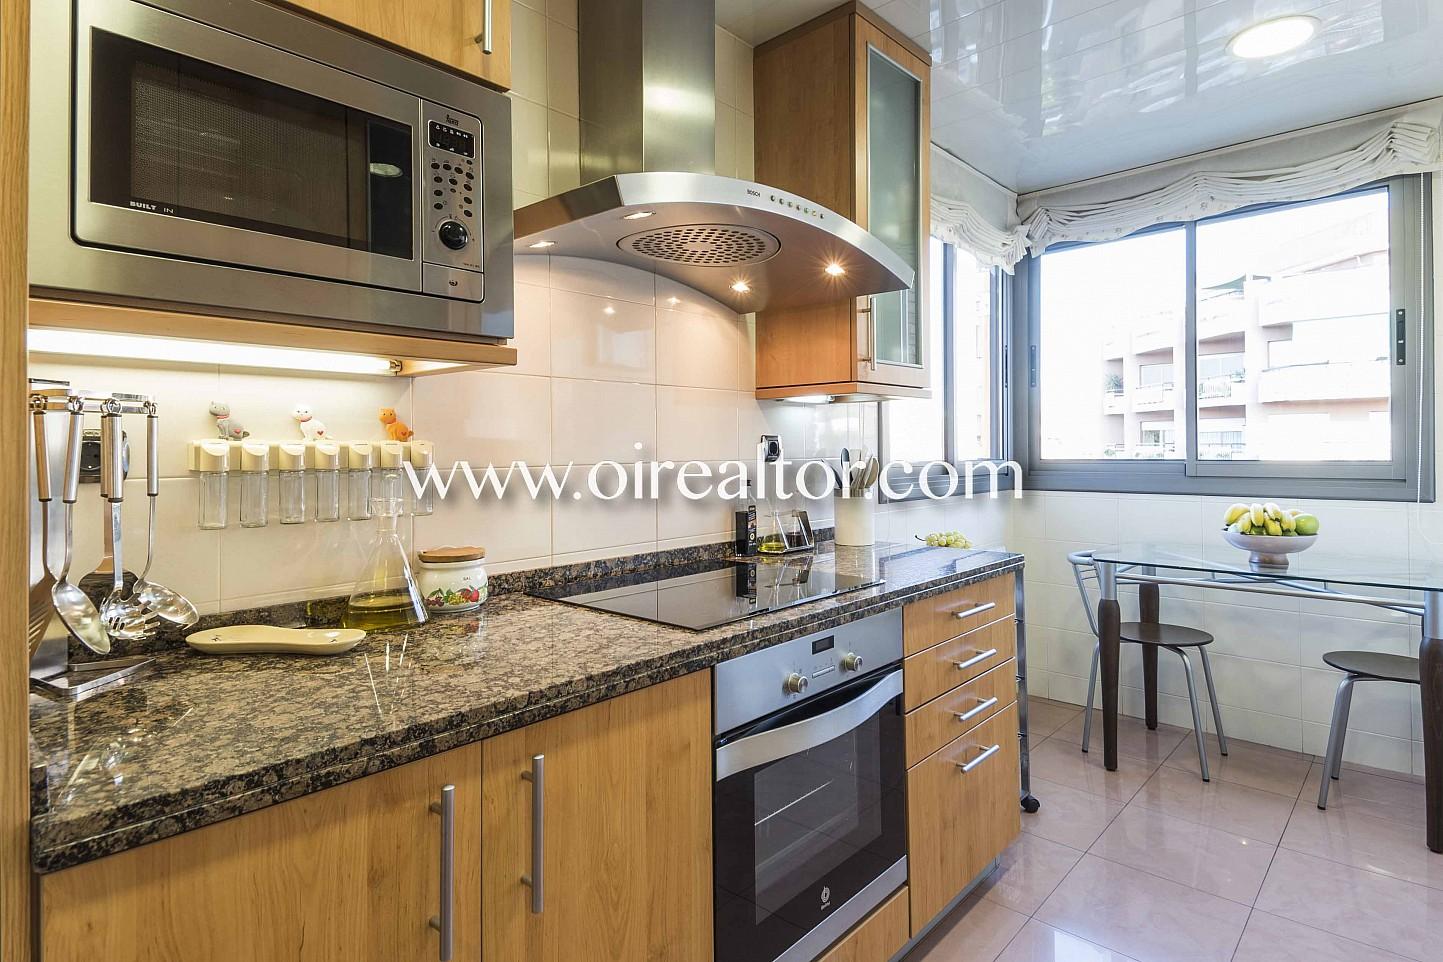 cocina, cocina con office, office, cocina office, electrodomésticos, cocina con electrodomésticos, horno, campana extractora, vitrocerámica